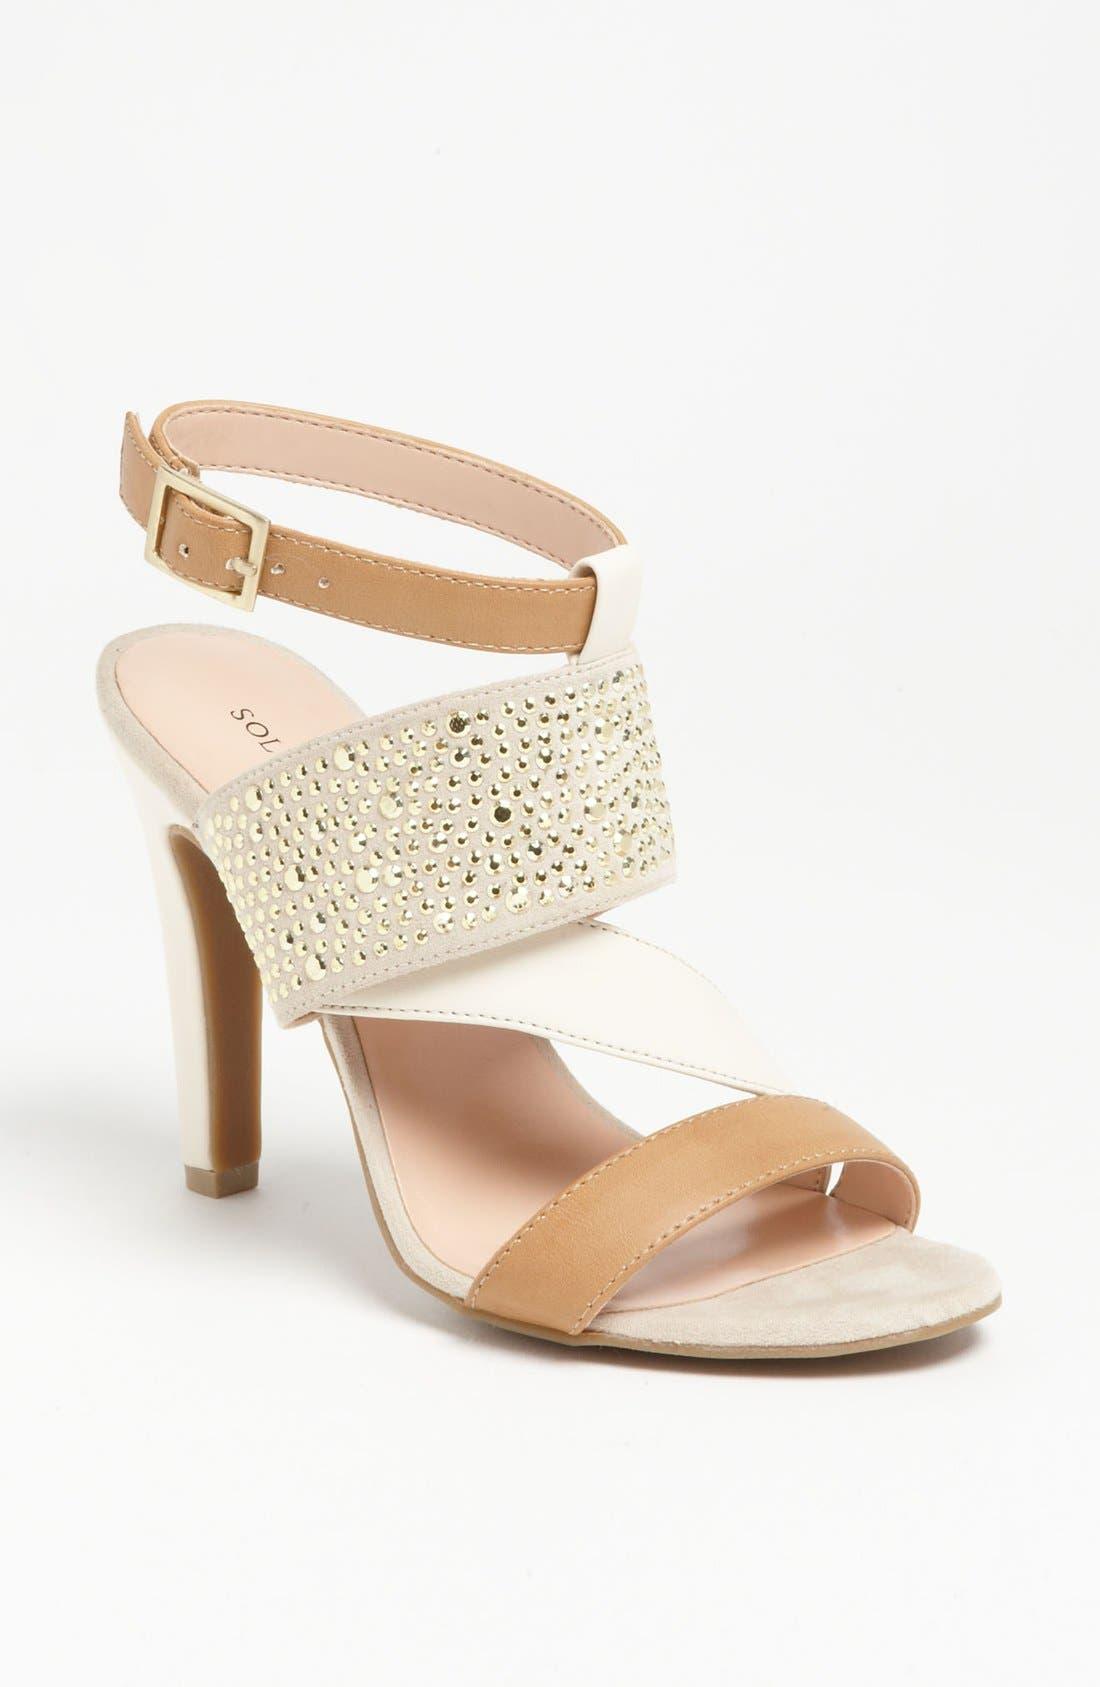 Alternate Image 1 Selected - Sole Society 'Savannah' Sandal